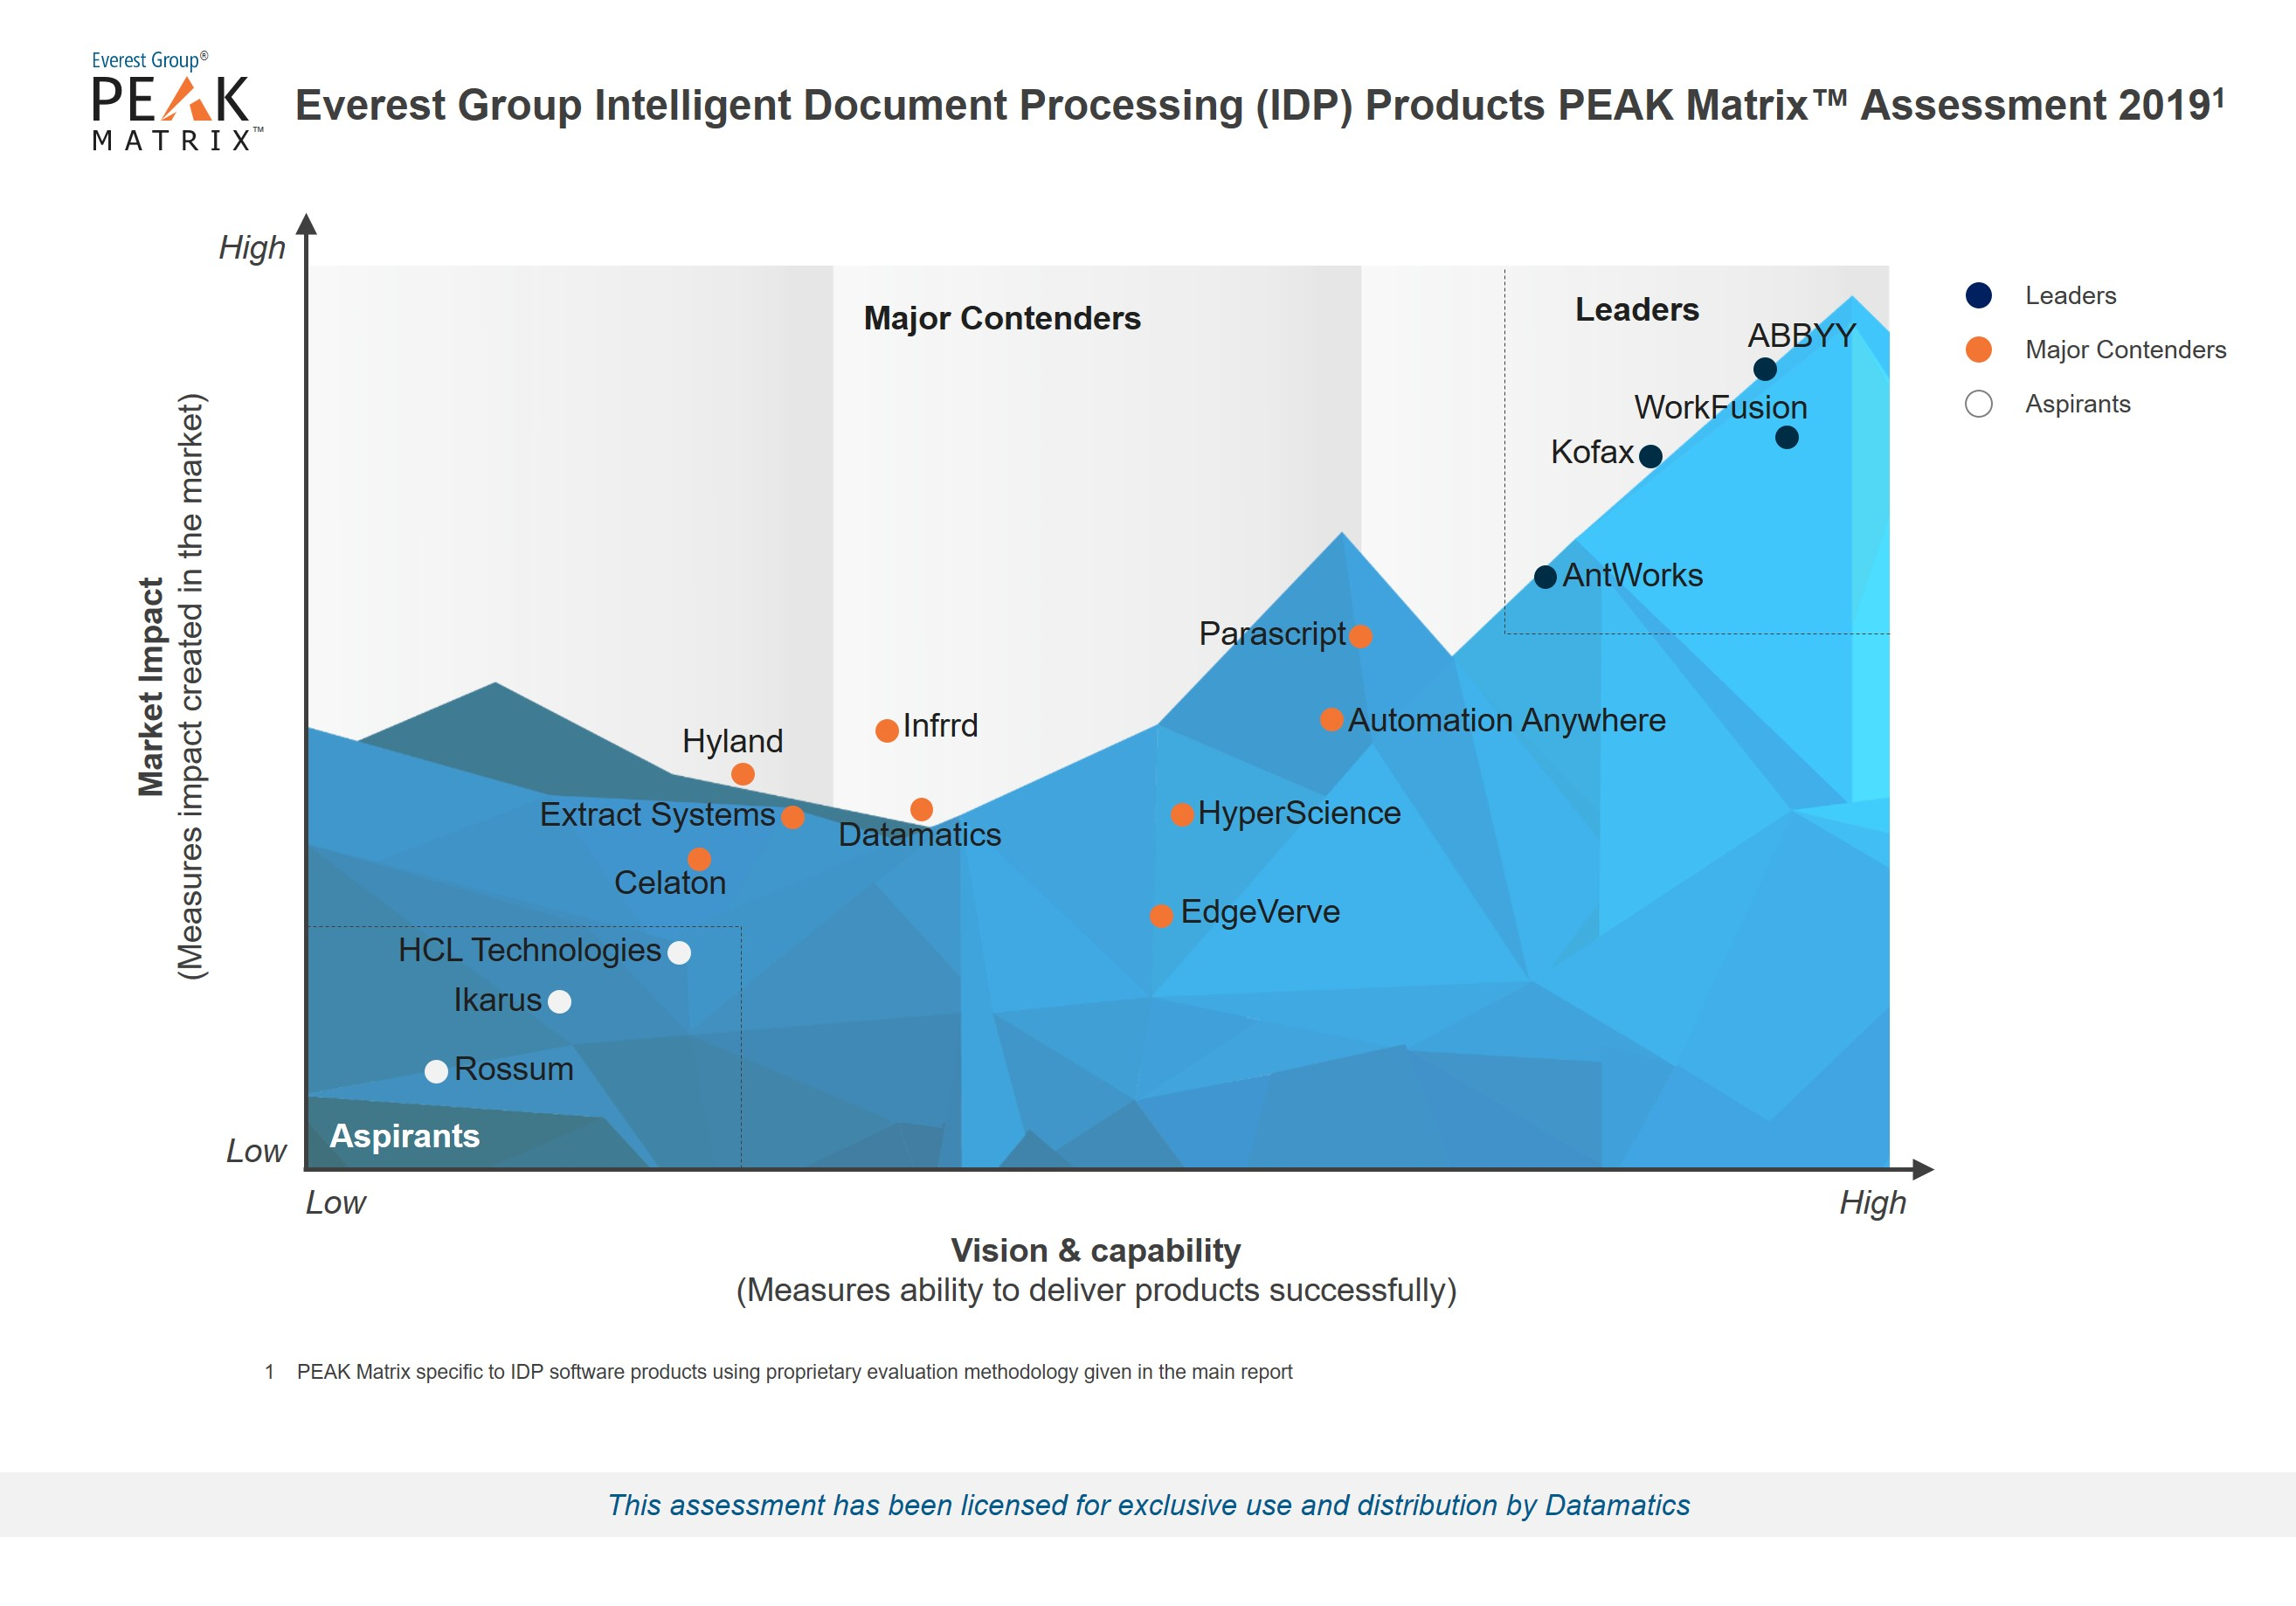 Everest Group IDP PEAK Matrix 2019_Datamatics